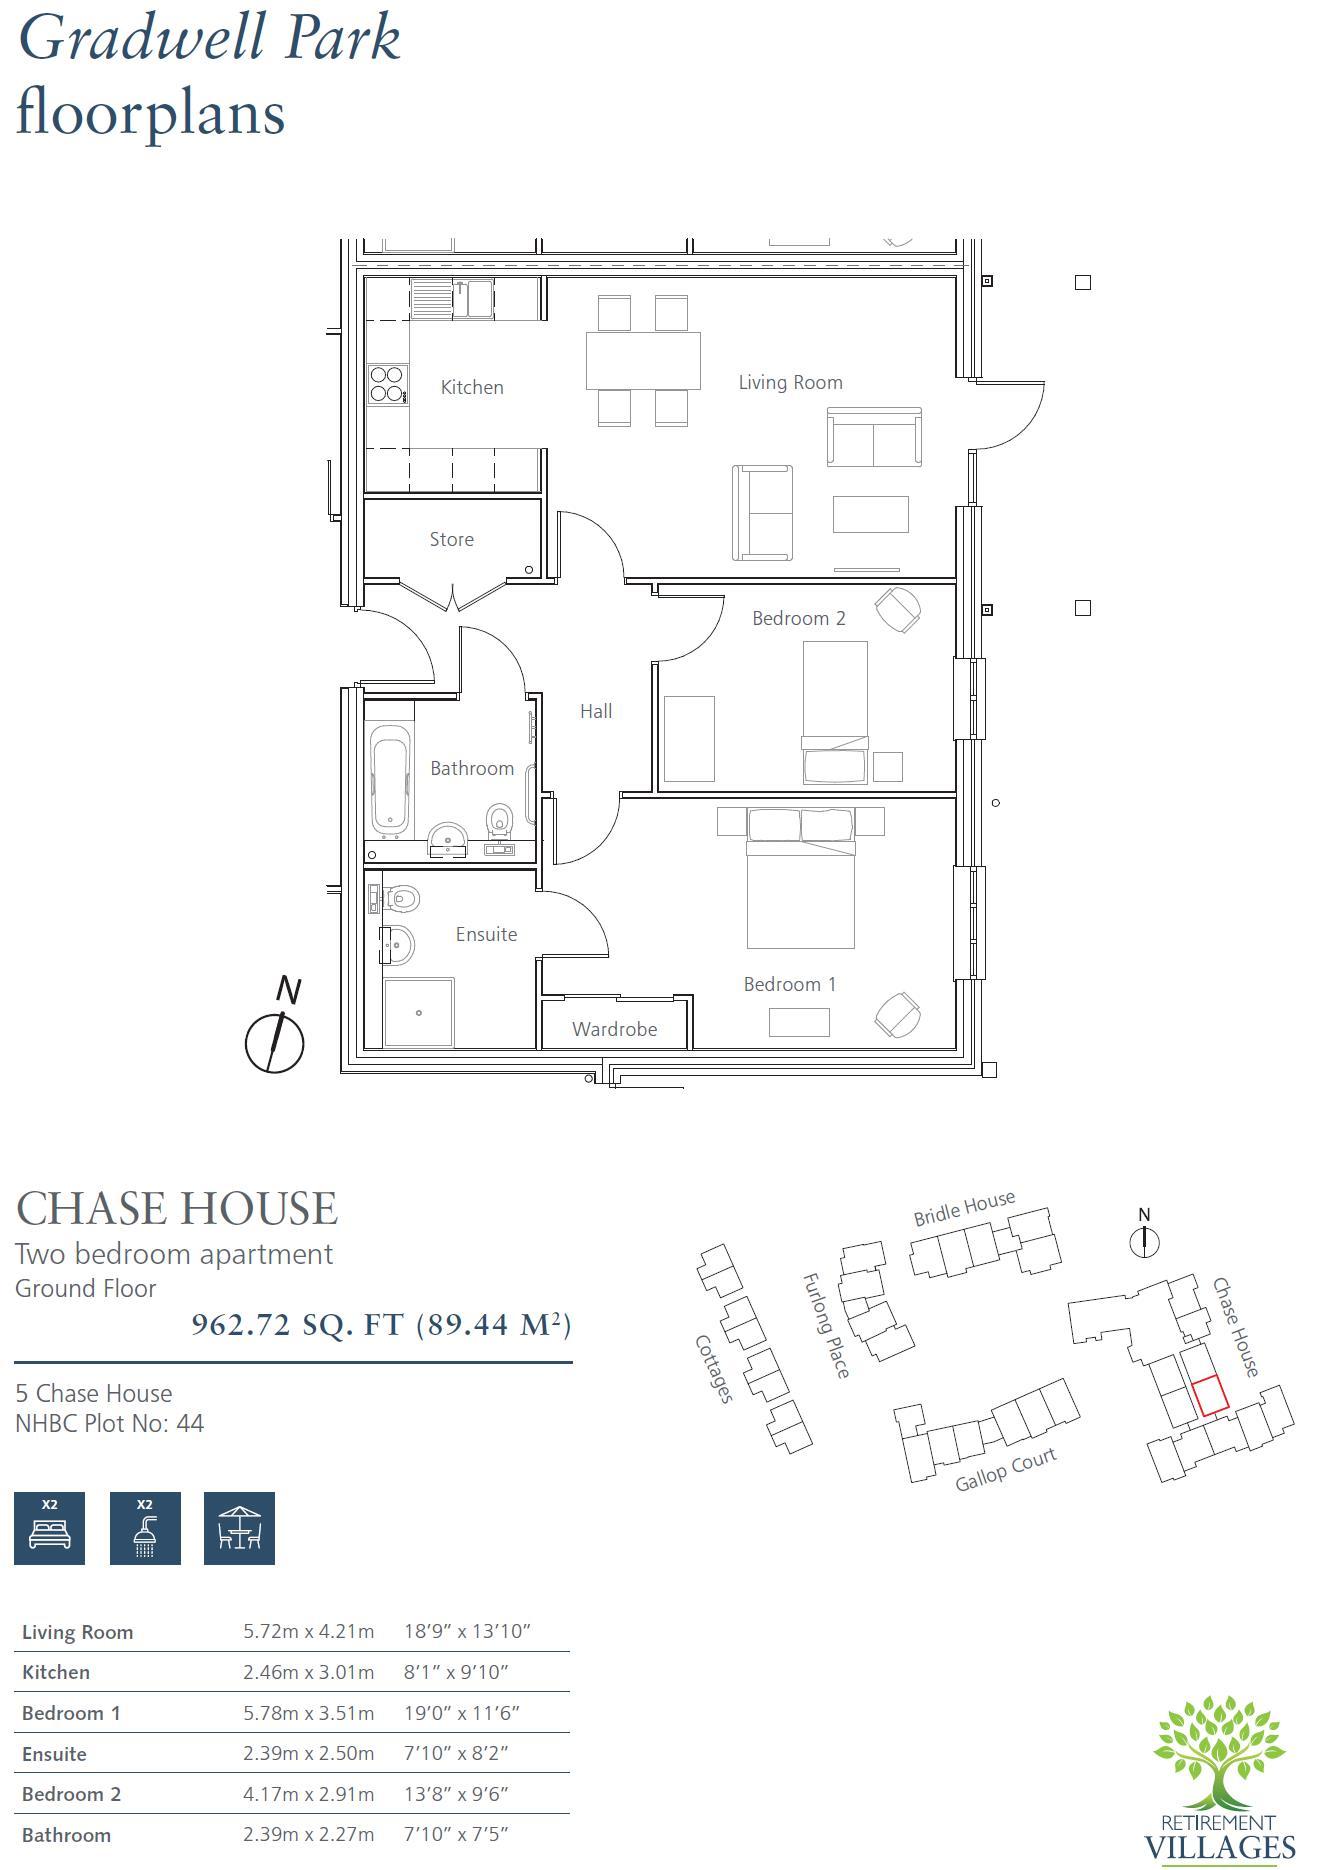 New Build, 5 Chase House Floorplan